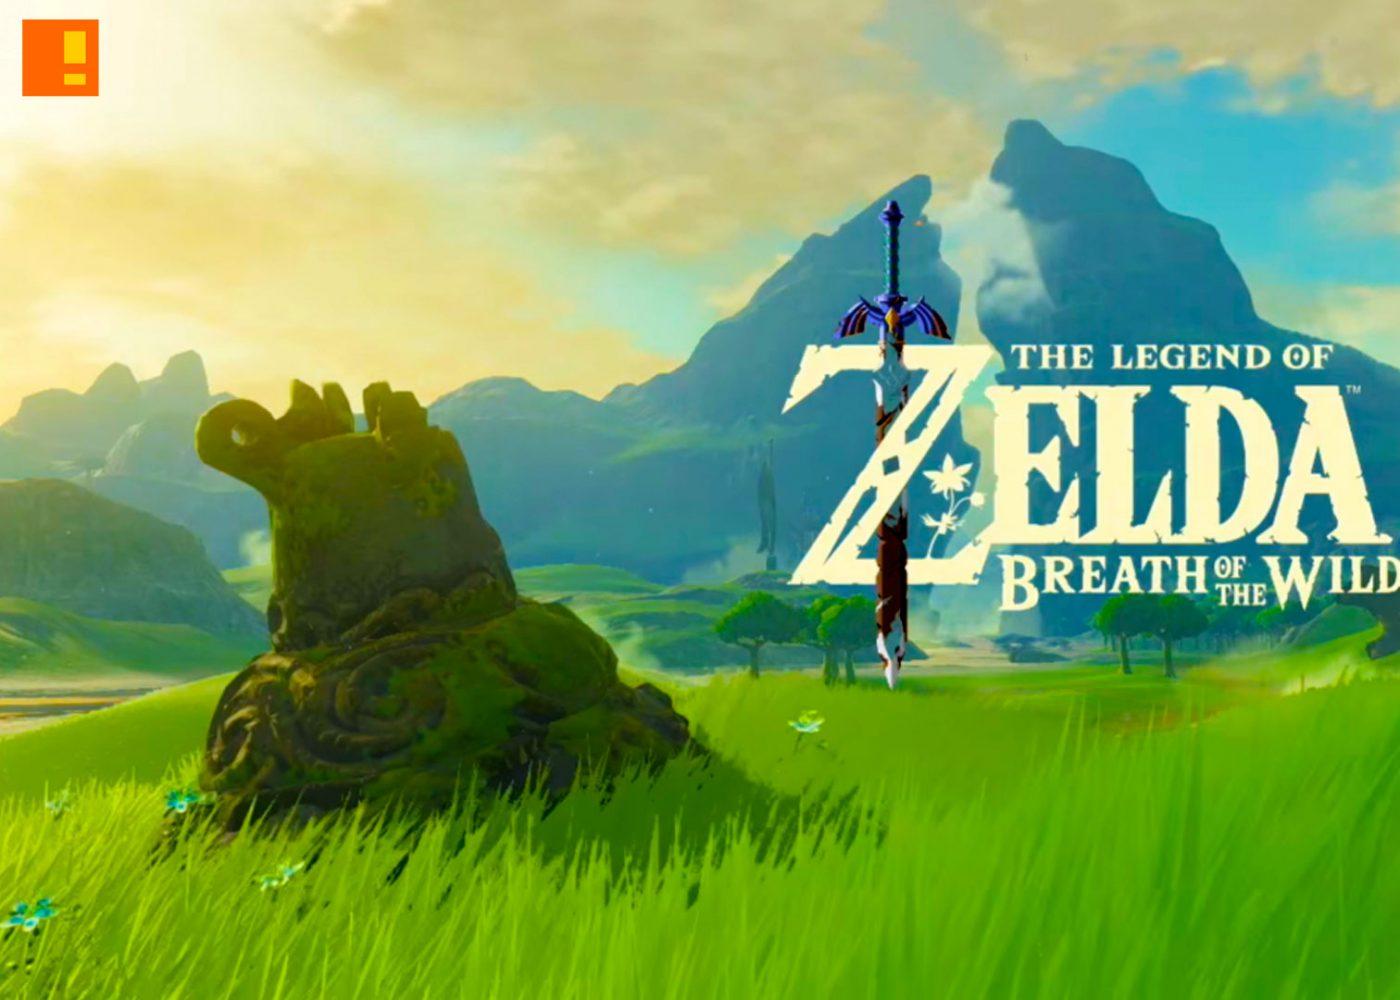 the legend of zelda, breath of the wild, link, zelda, nx, nintendo, gameplay, trailer, e3, e3 2016, e3 expo, the action pixel, @theactionpixel, entertainment on tap